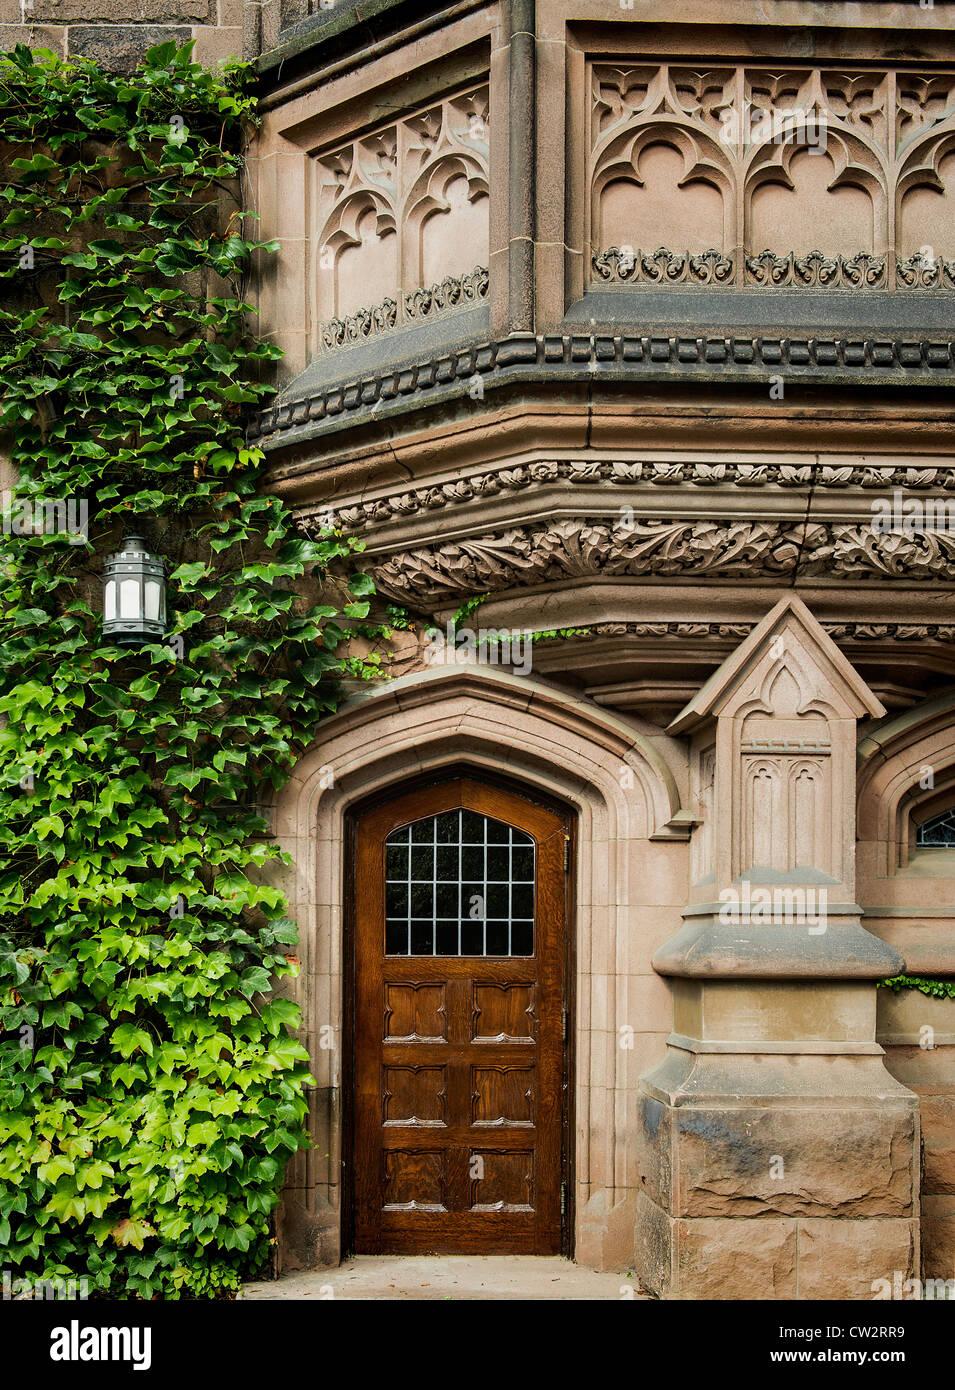 Ivy League architecture, Princeton University, New Jersey, USA Stock Photo